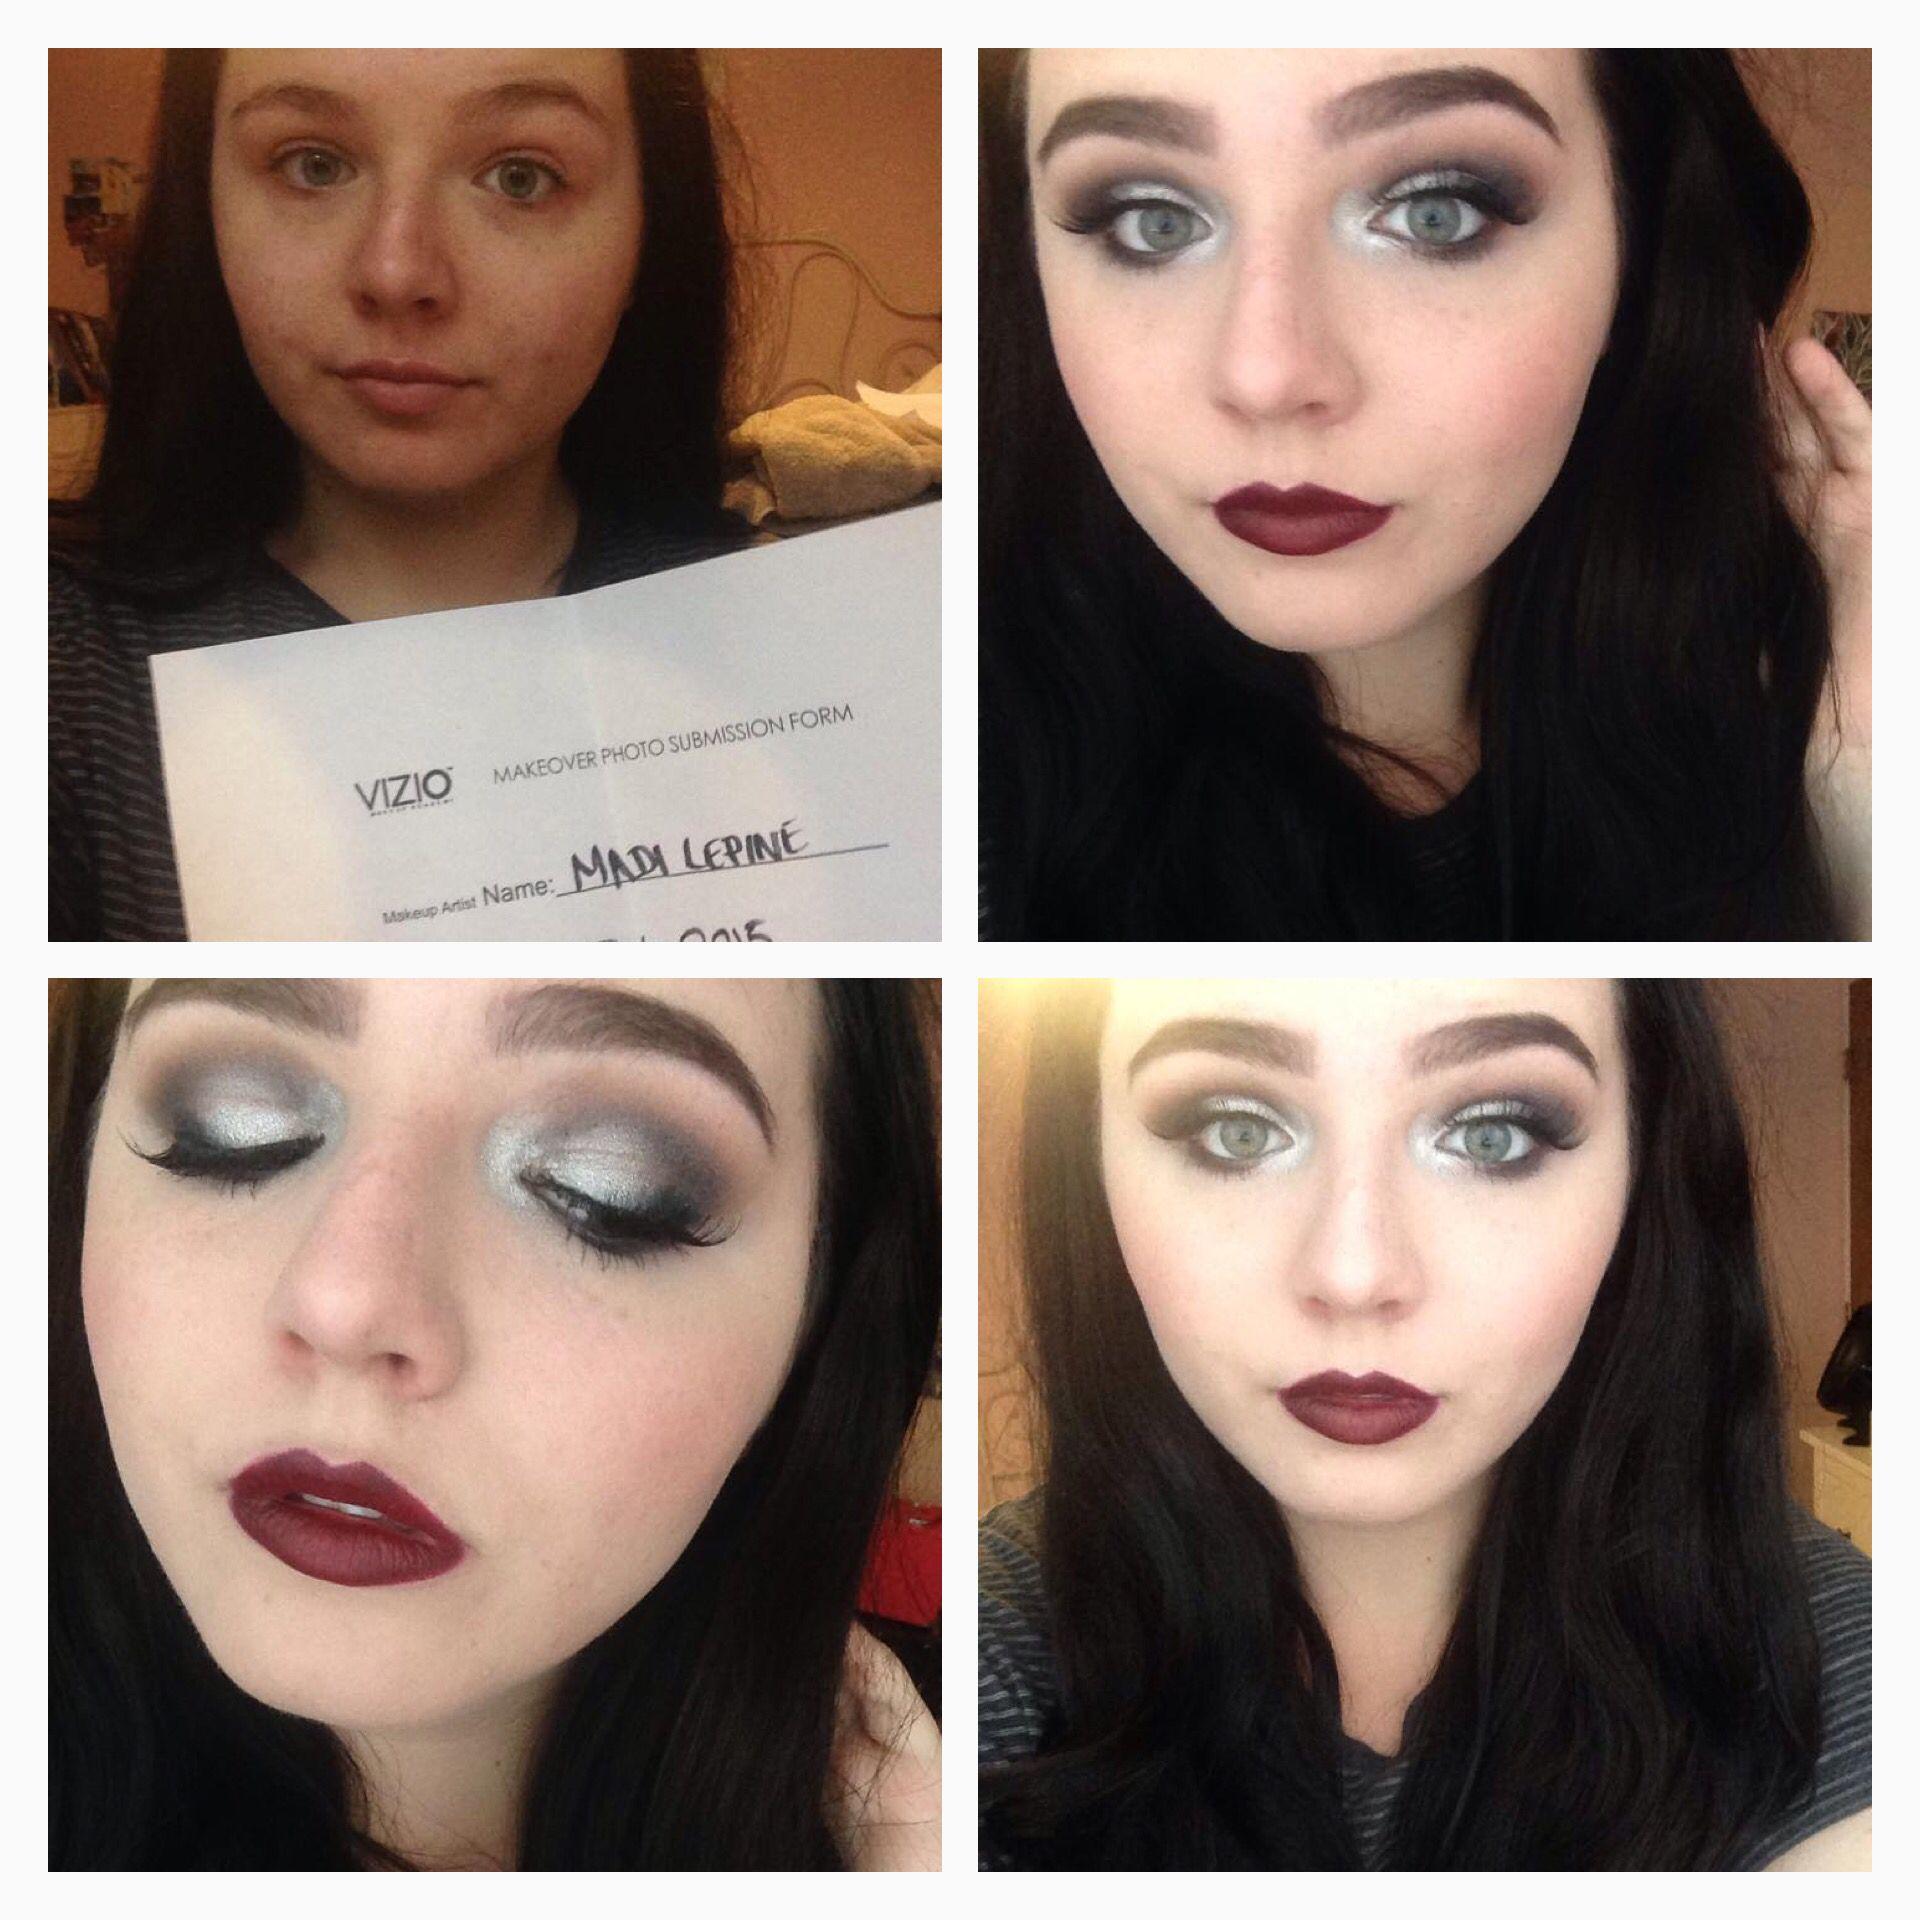 Madi's amazing roaring 20's vintage makeup look 💋 Vizio